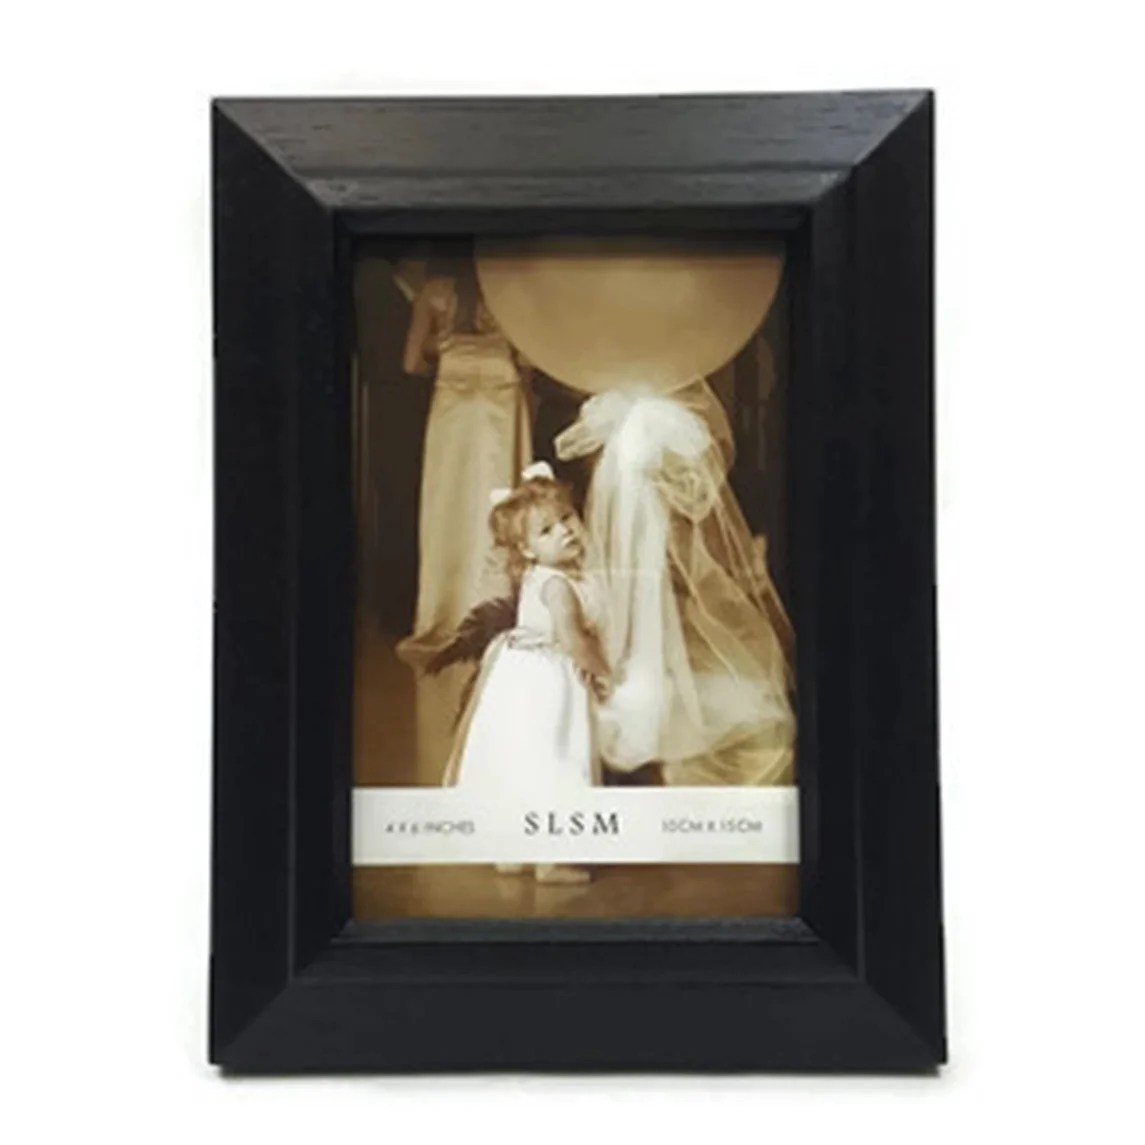 "Elegance 4x6"" Wood Photo Frame, Narrow Border, Black Color"